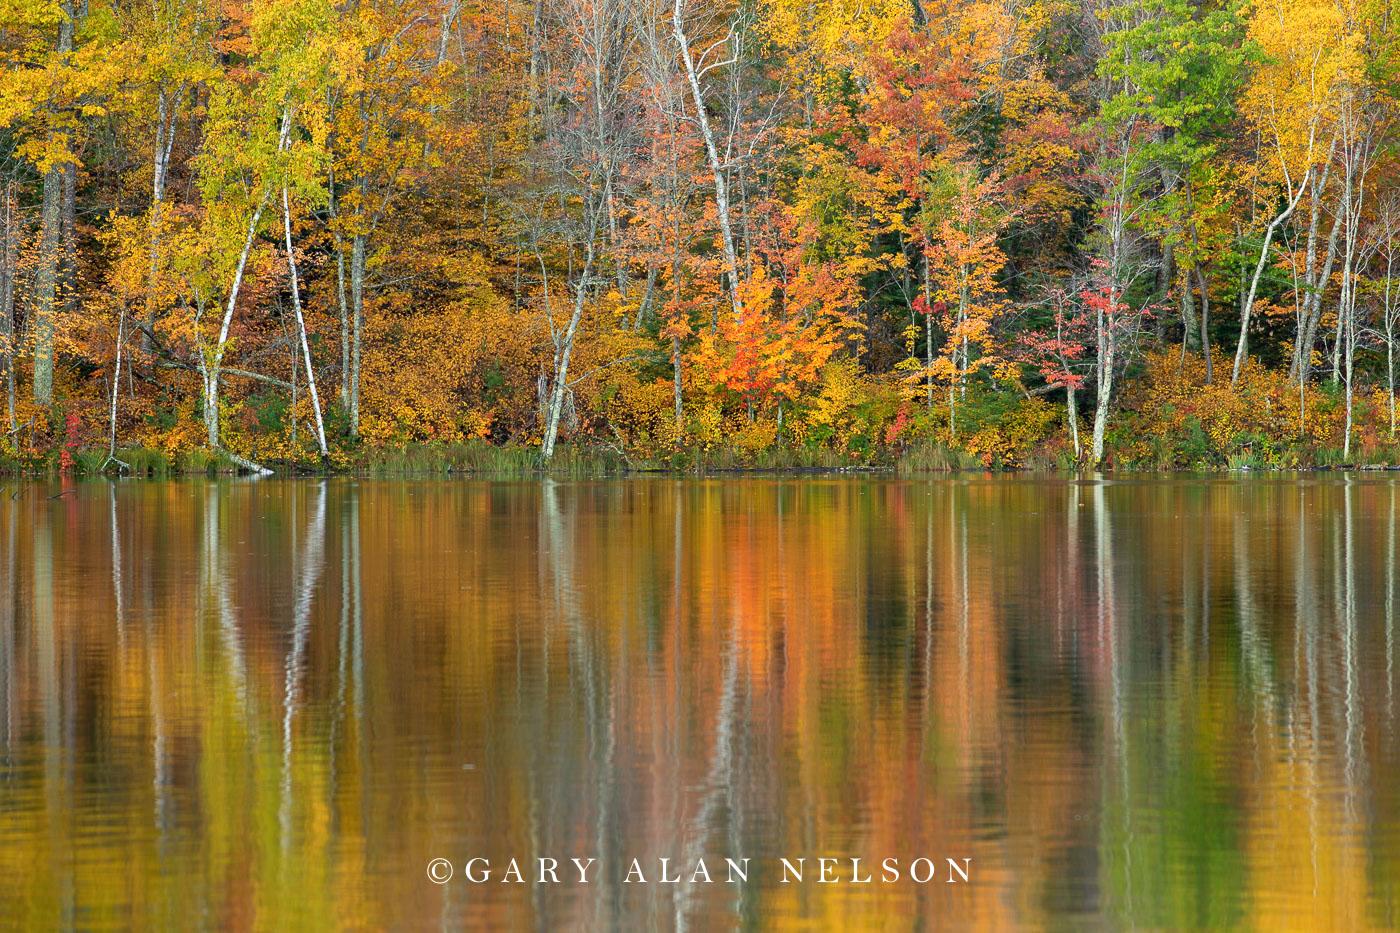 Autumn reflections on Loon Lake, Savannah Portage State Park, Minnesota